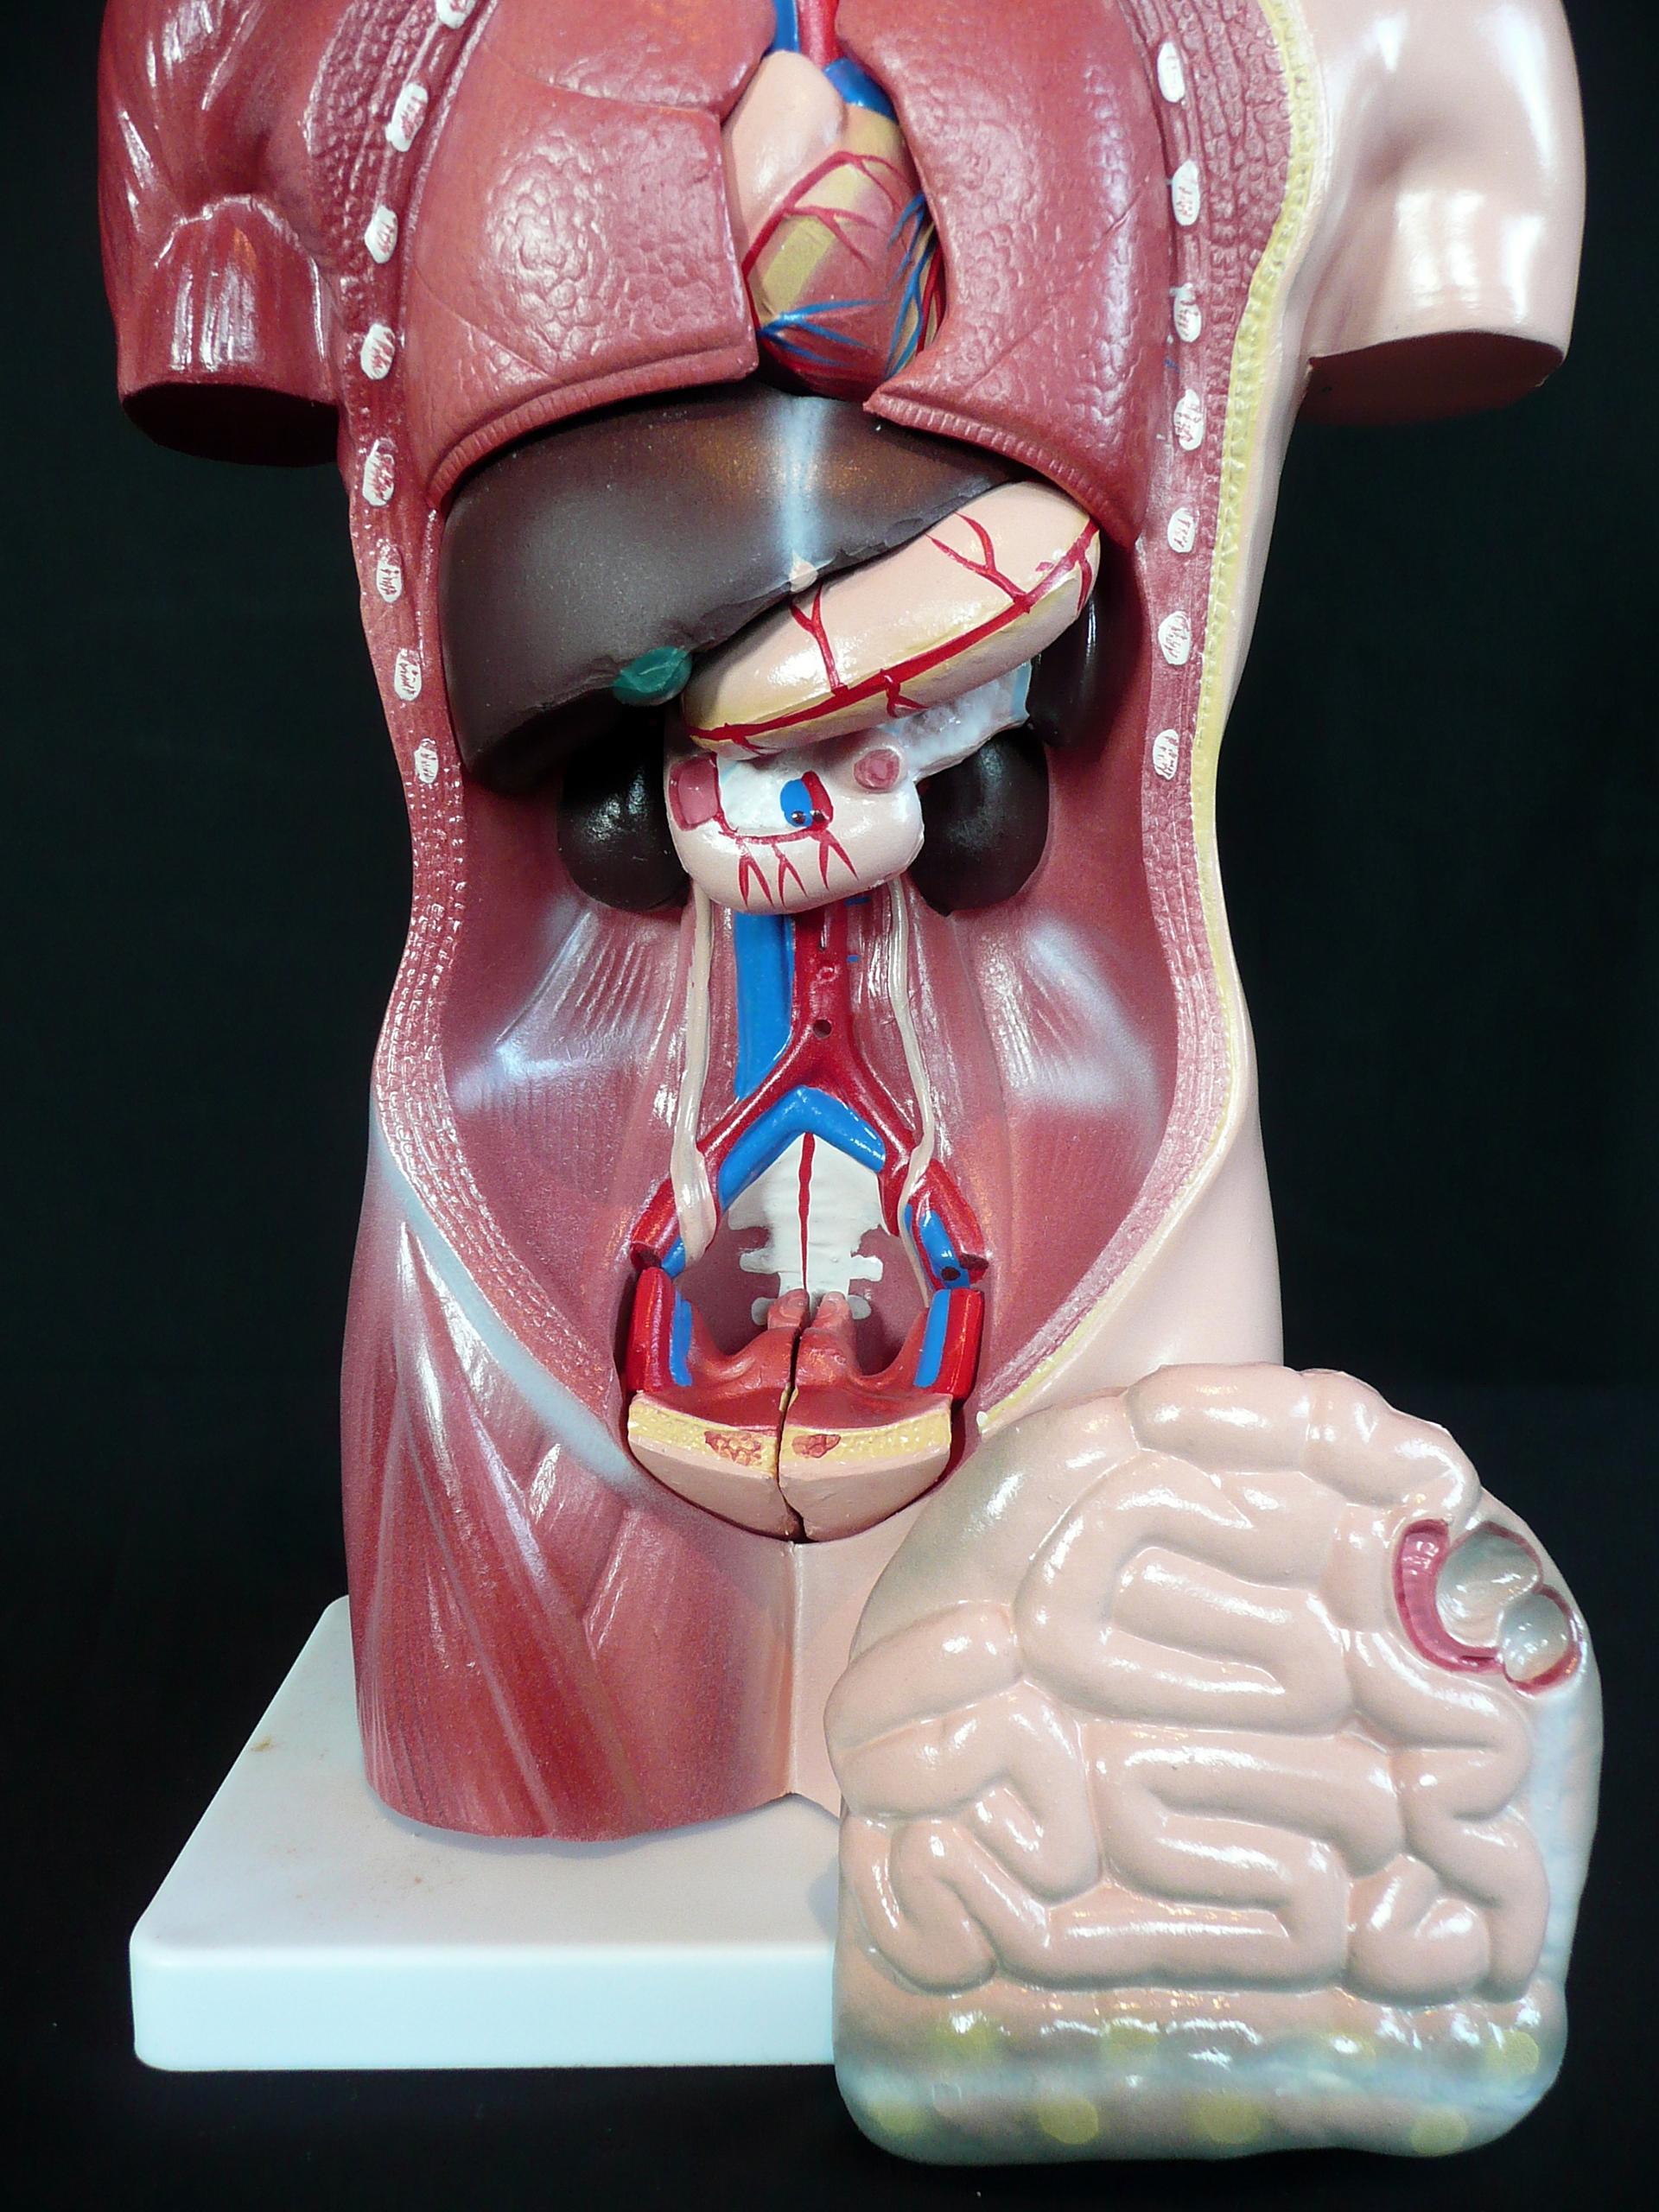 42cm tall human anatomical female torso model